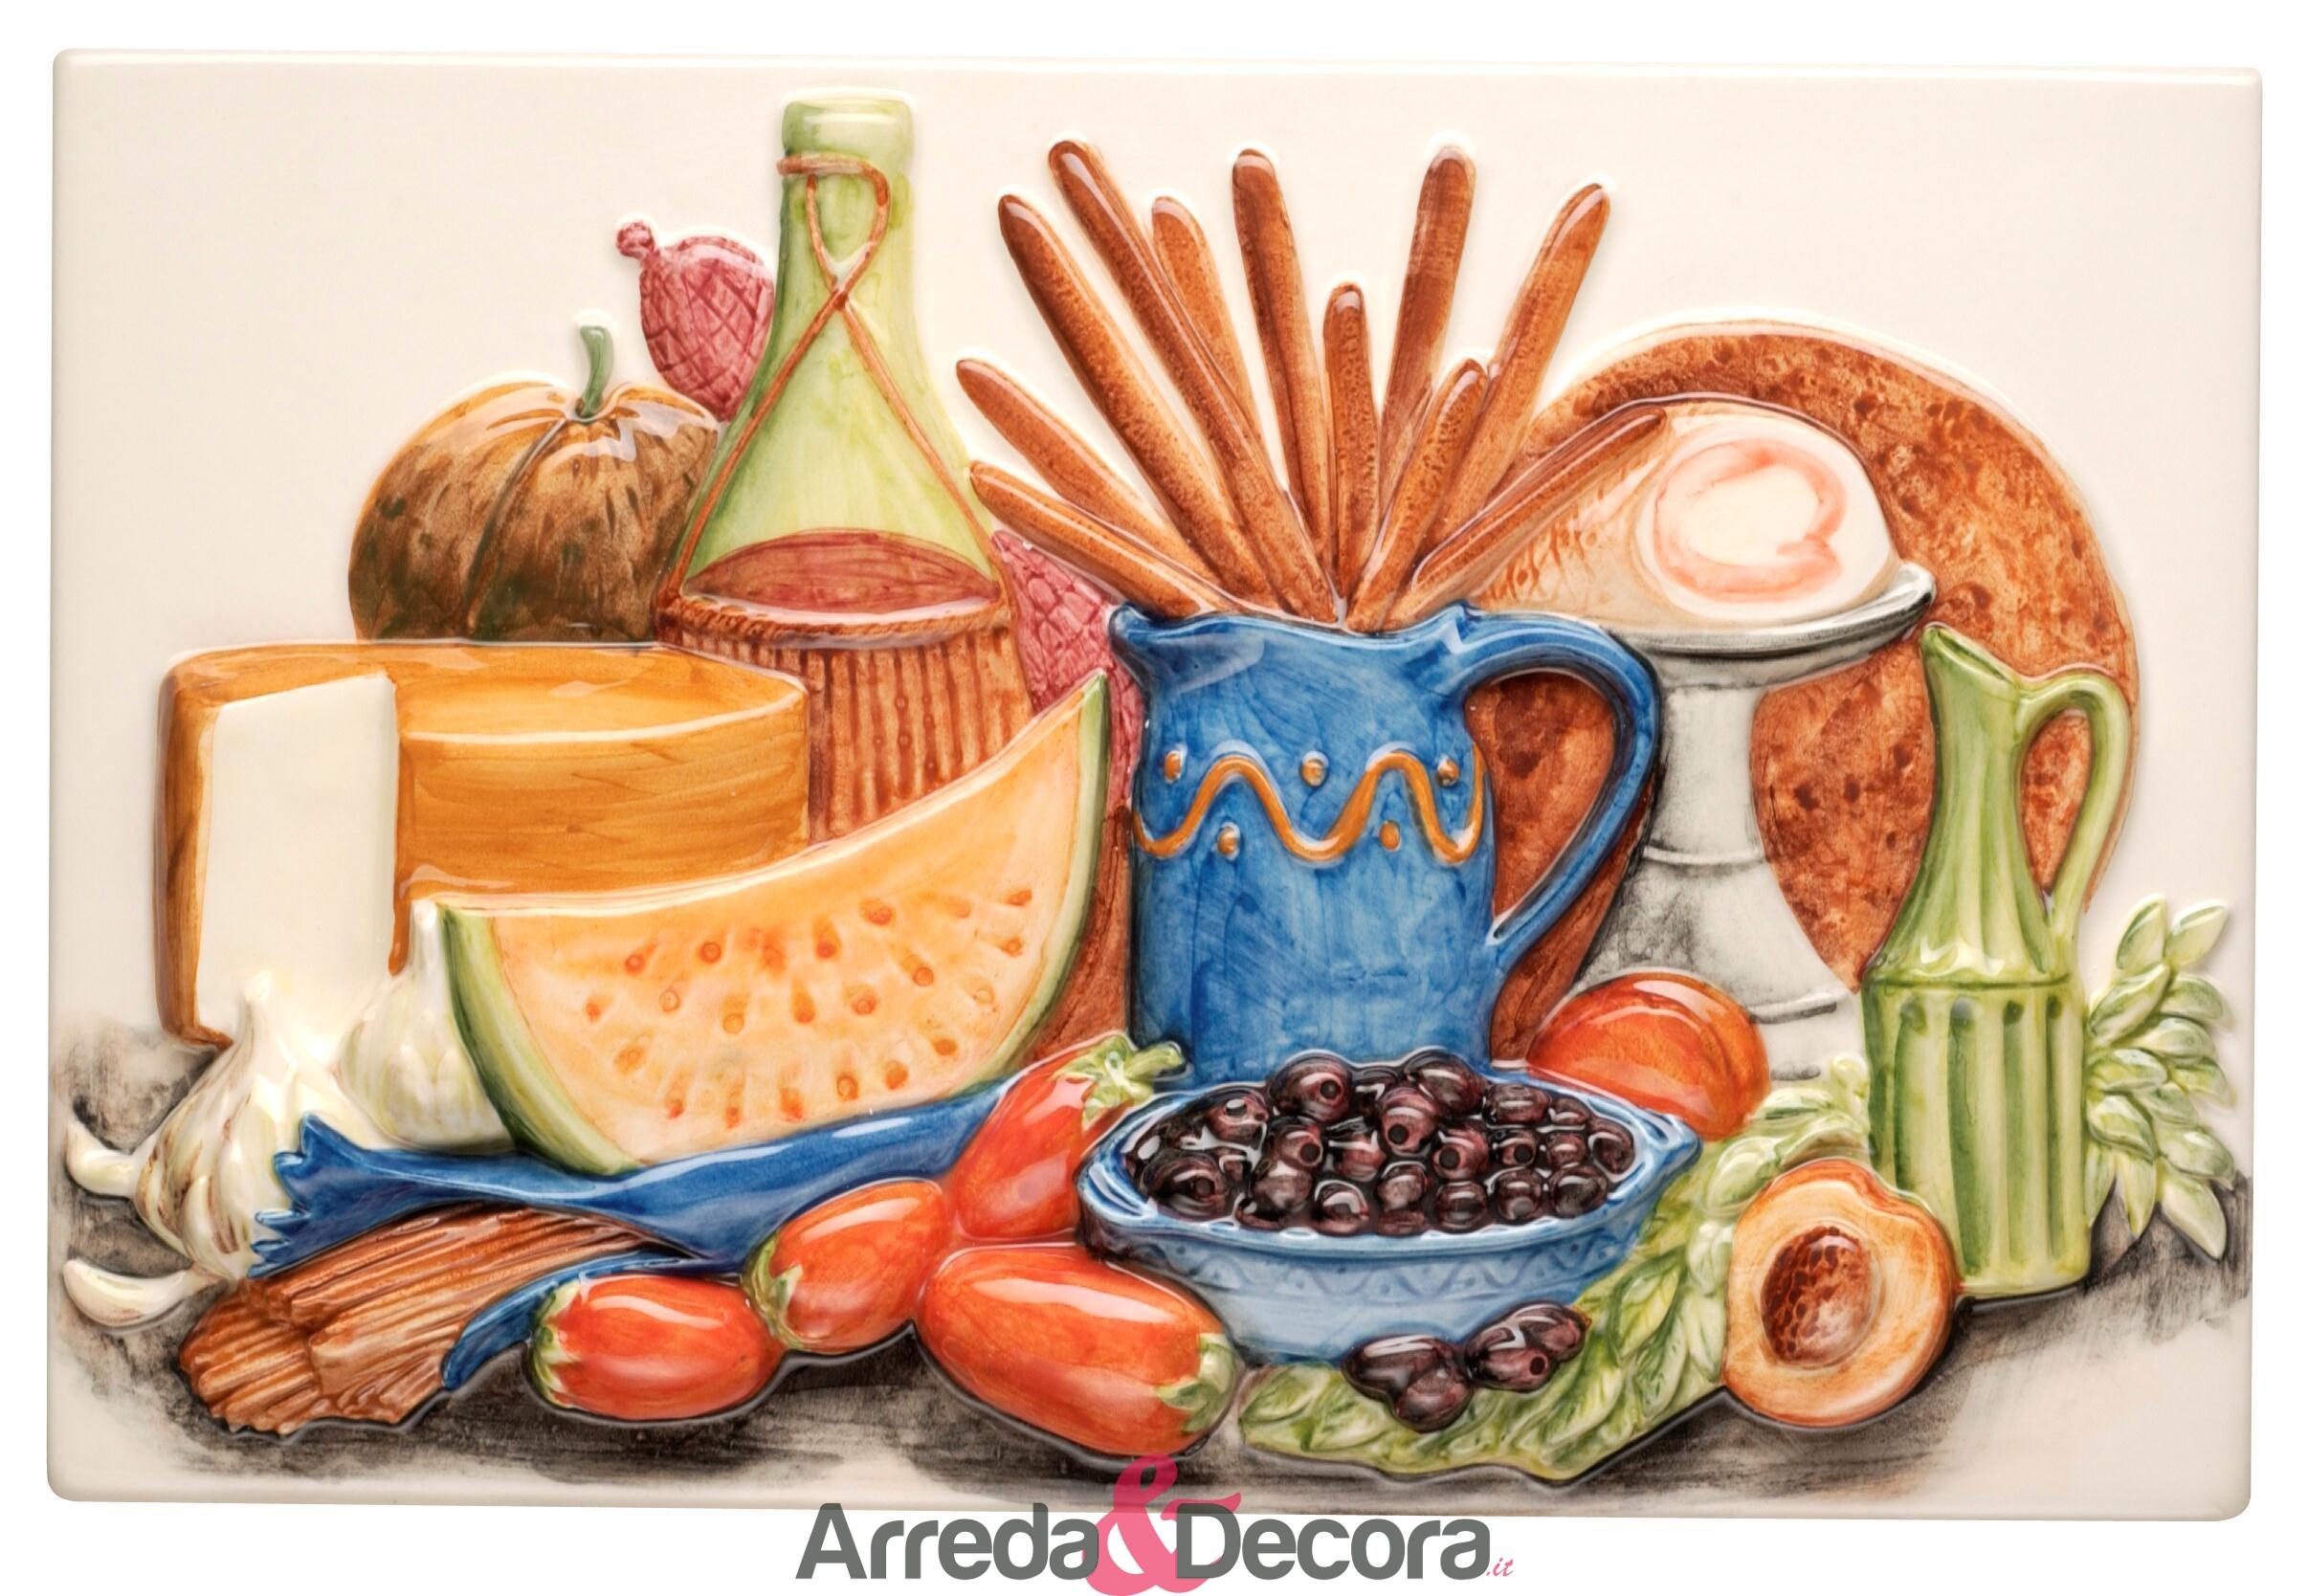 decoro-30x20-ingredienti-italiani